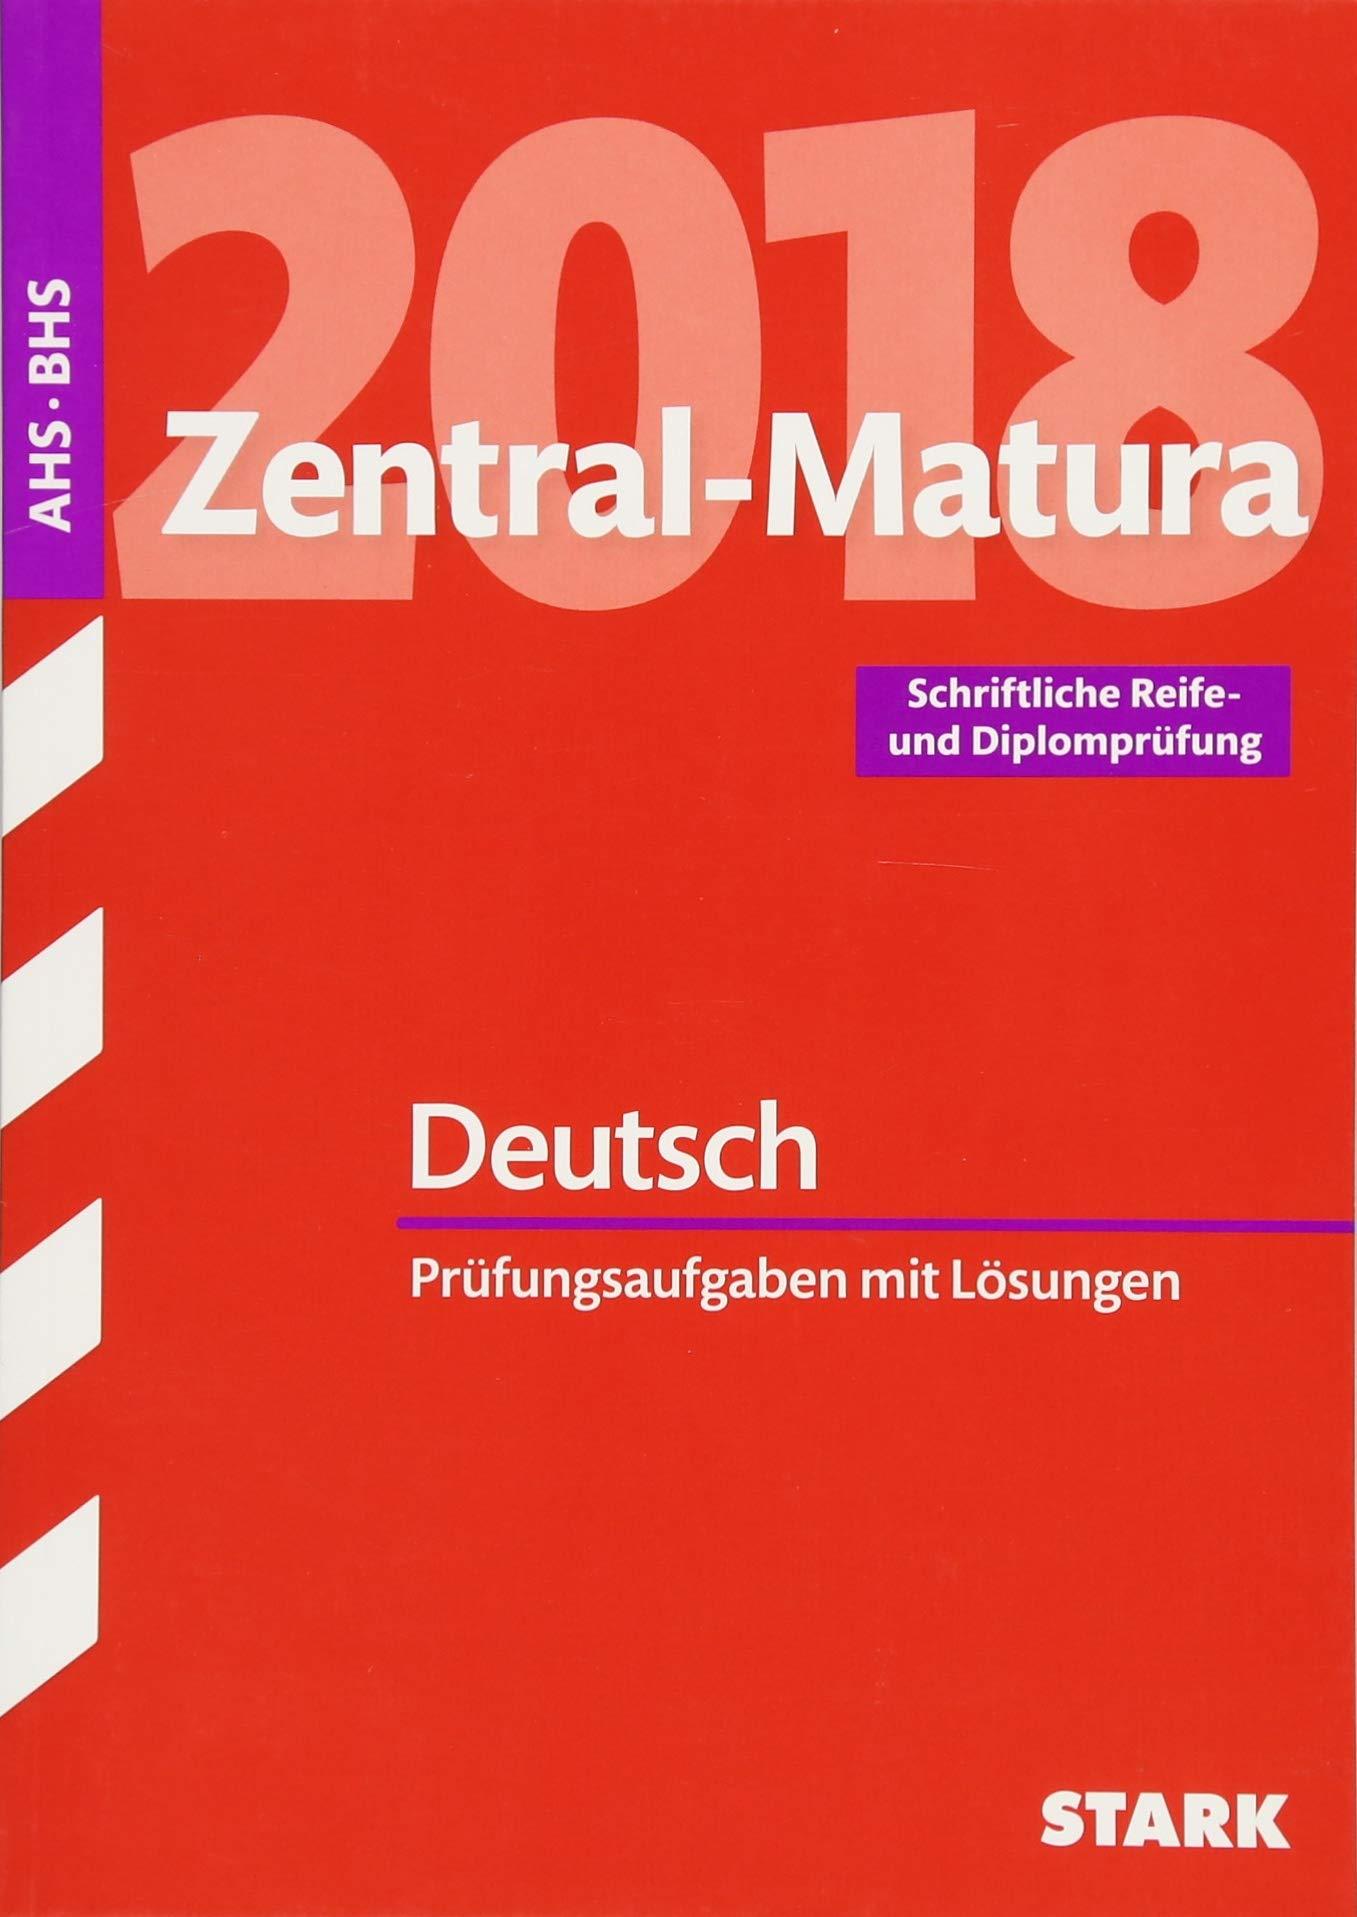 zentralmatura 2018